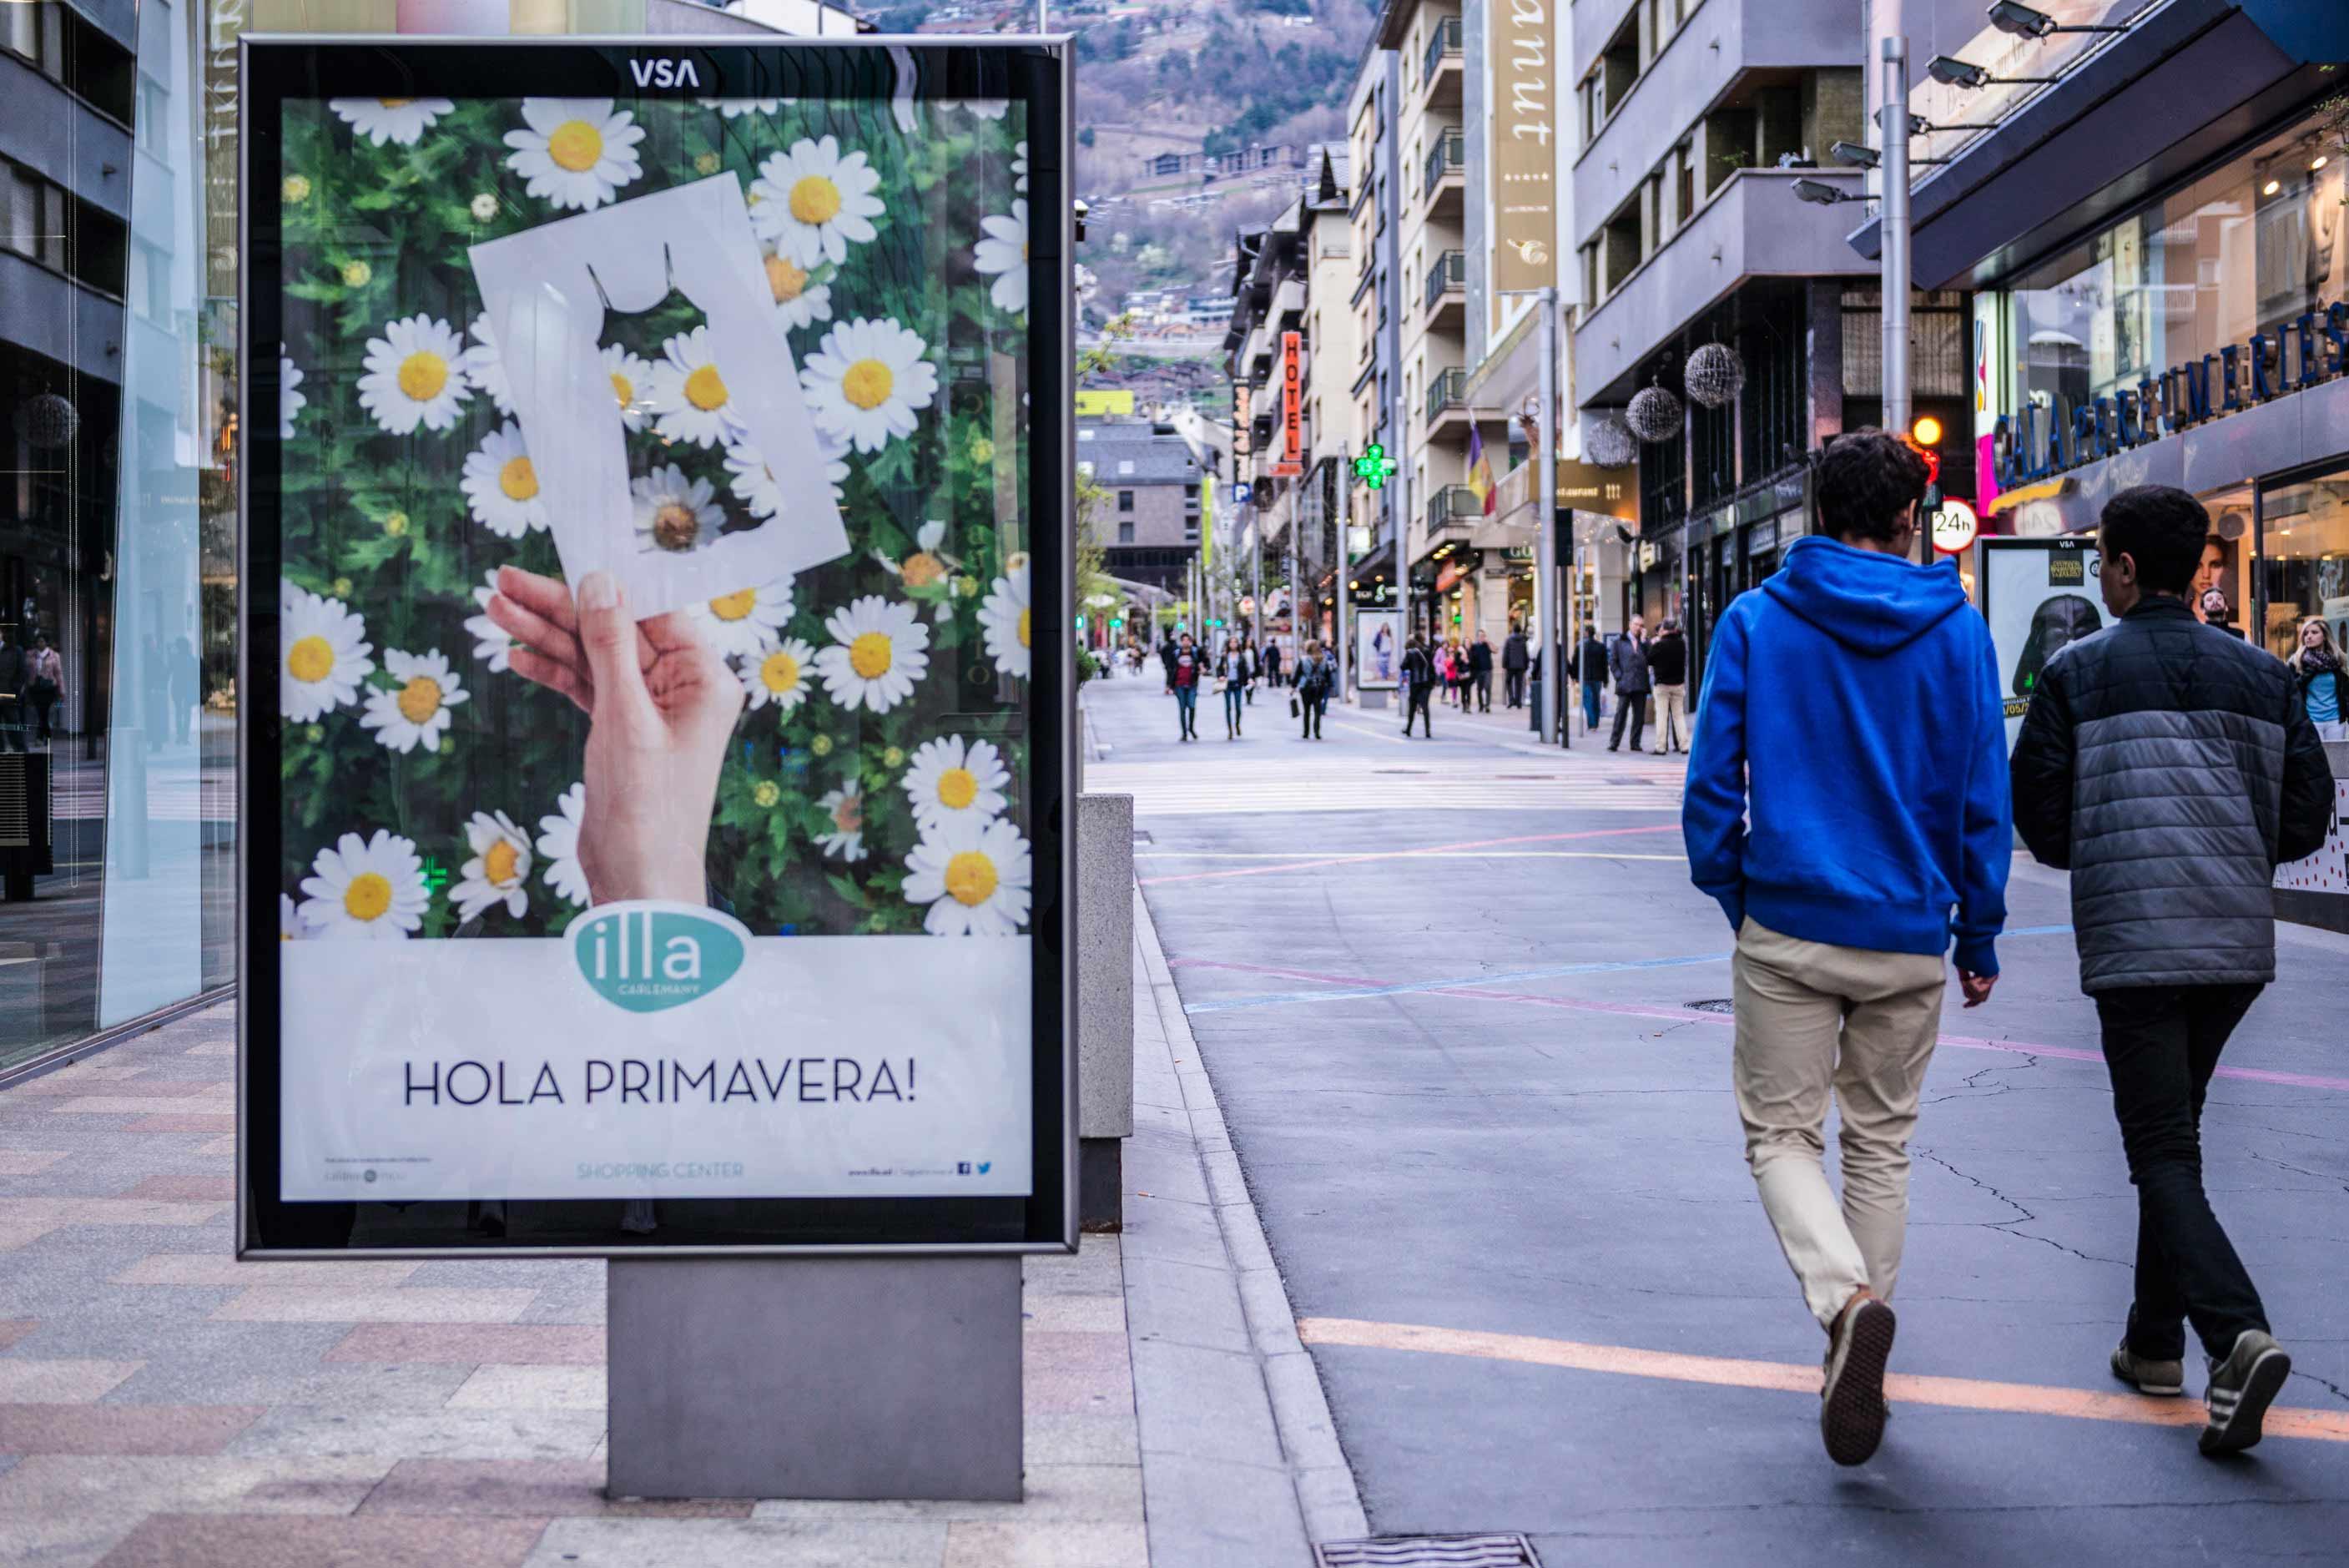 mobiliario-urbano-oppi-publicidad-exterior-centre-illa-carlemany-primavera-andorra-vsa-comunicacion